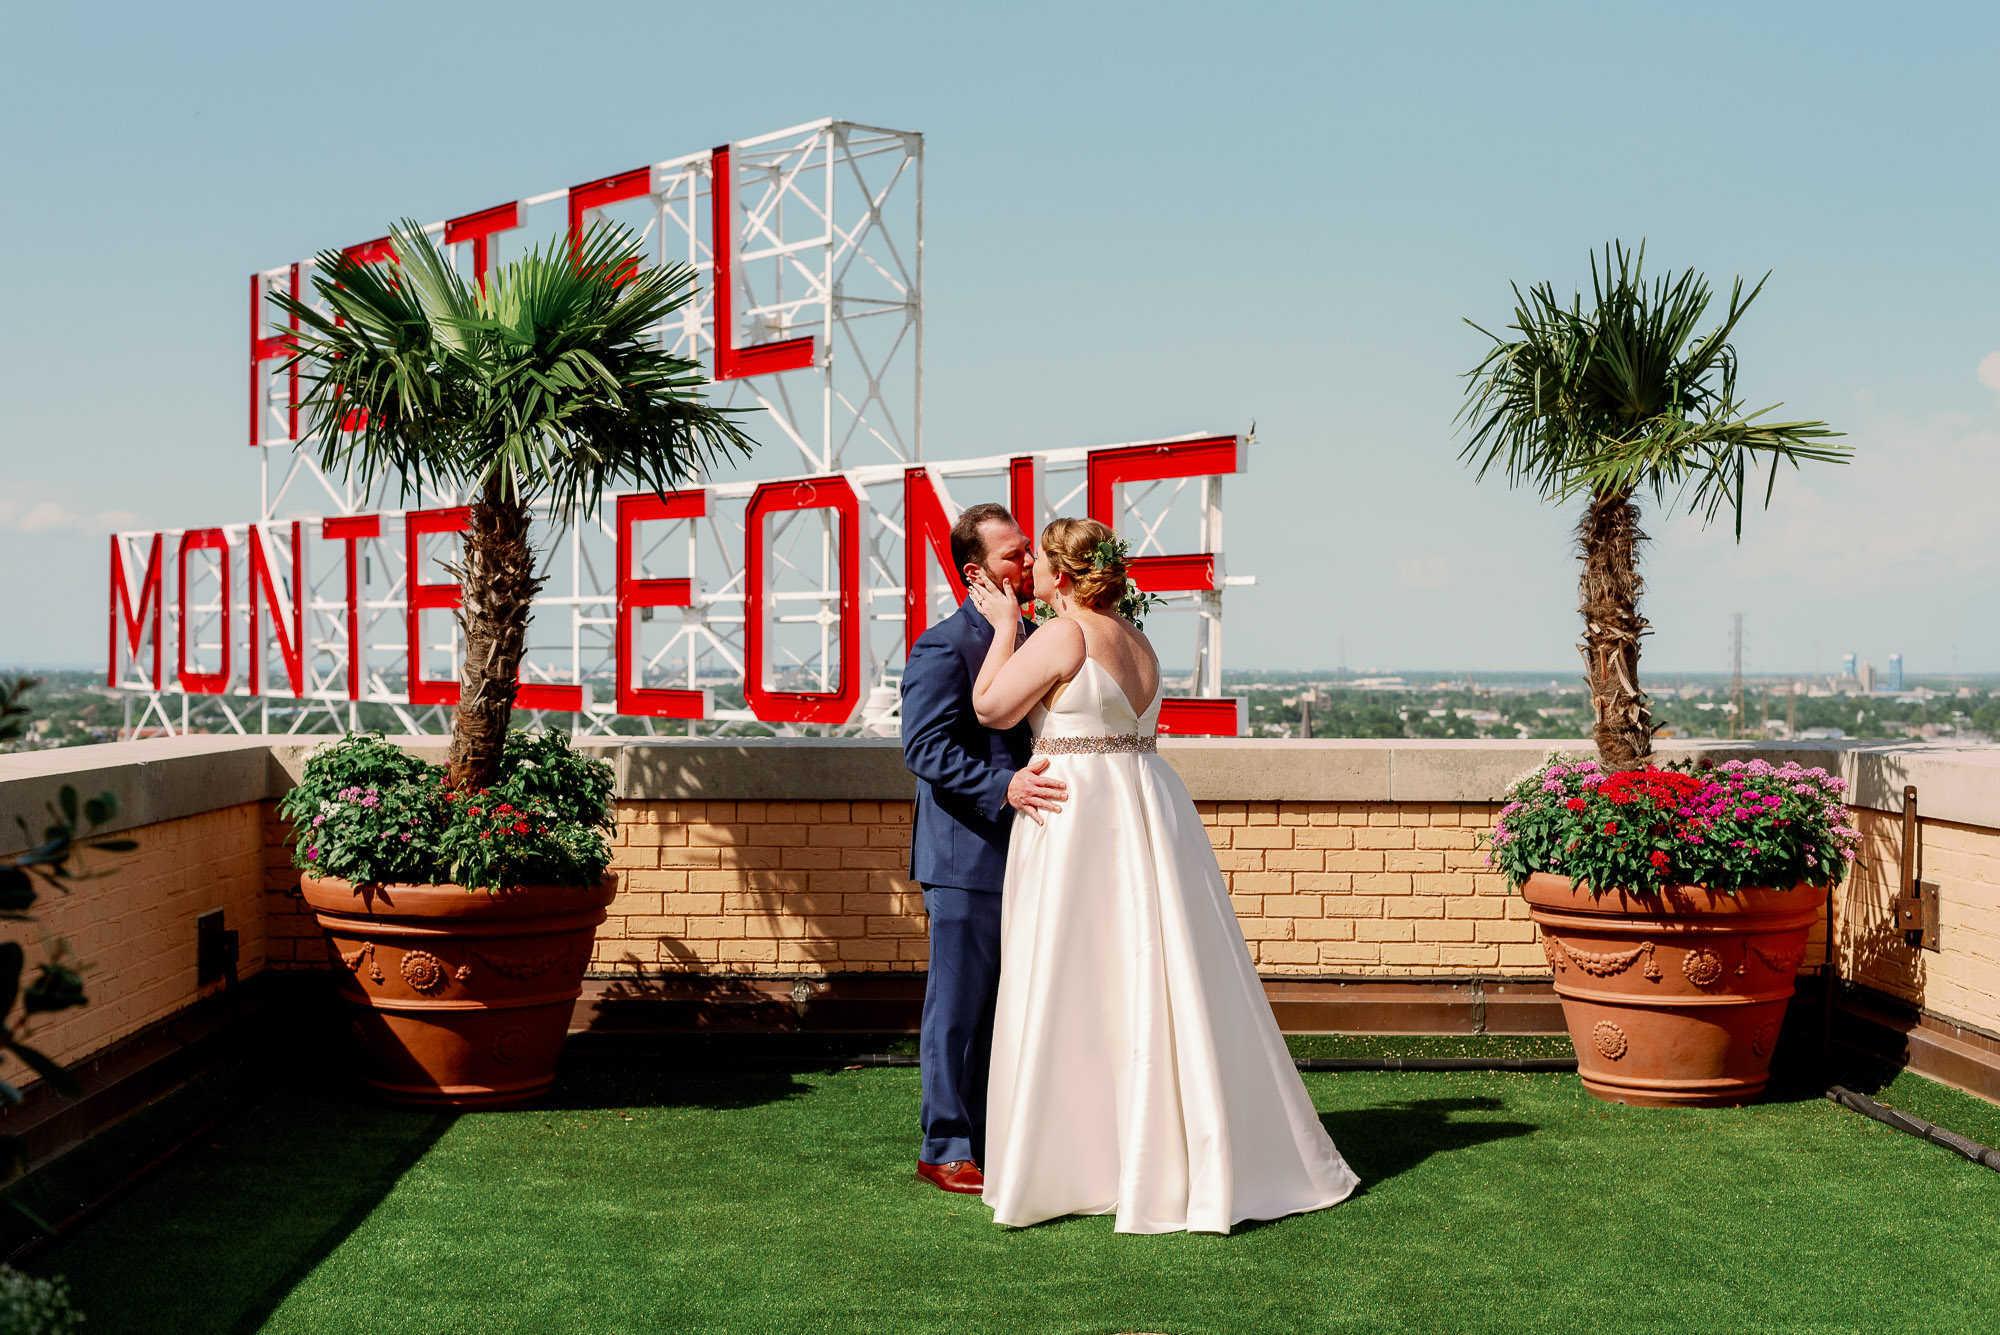 Marche New Orleans Wedding Venue Photographer (13).jpg